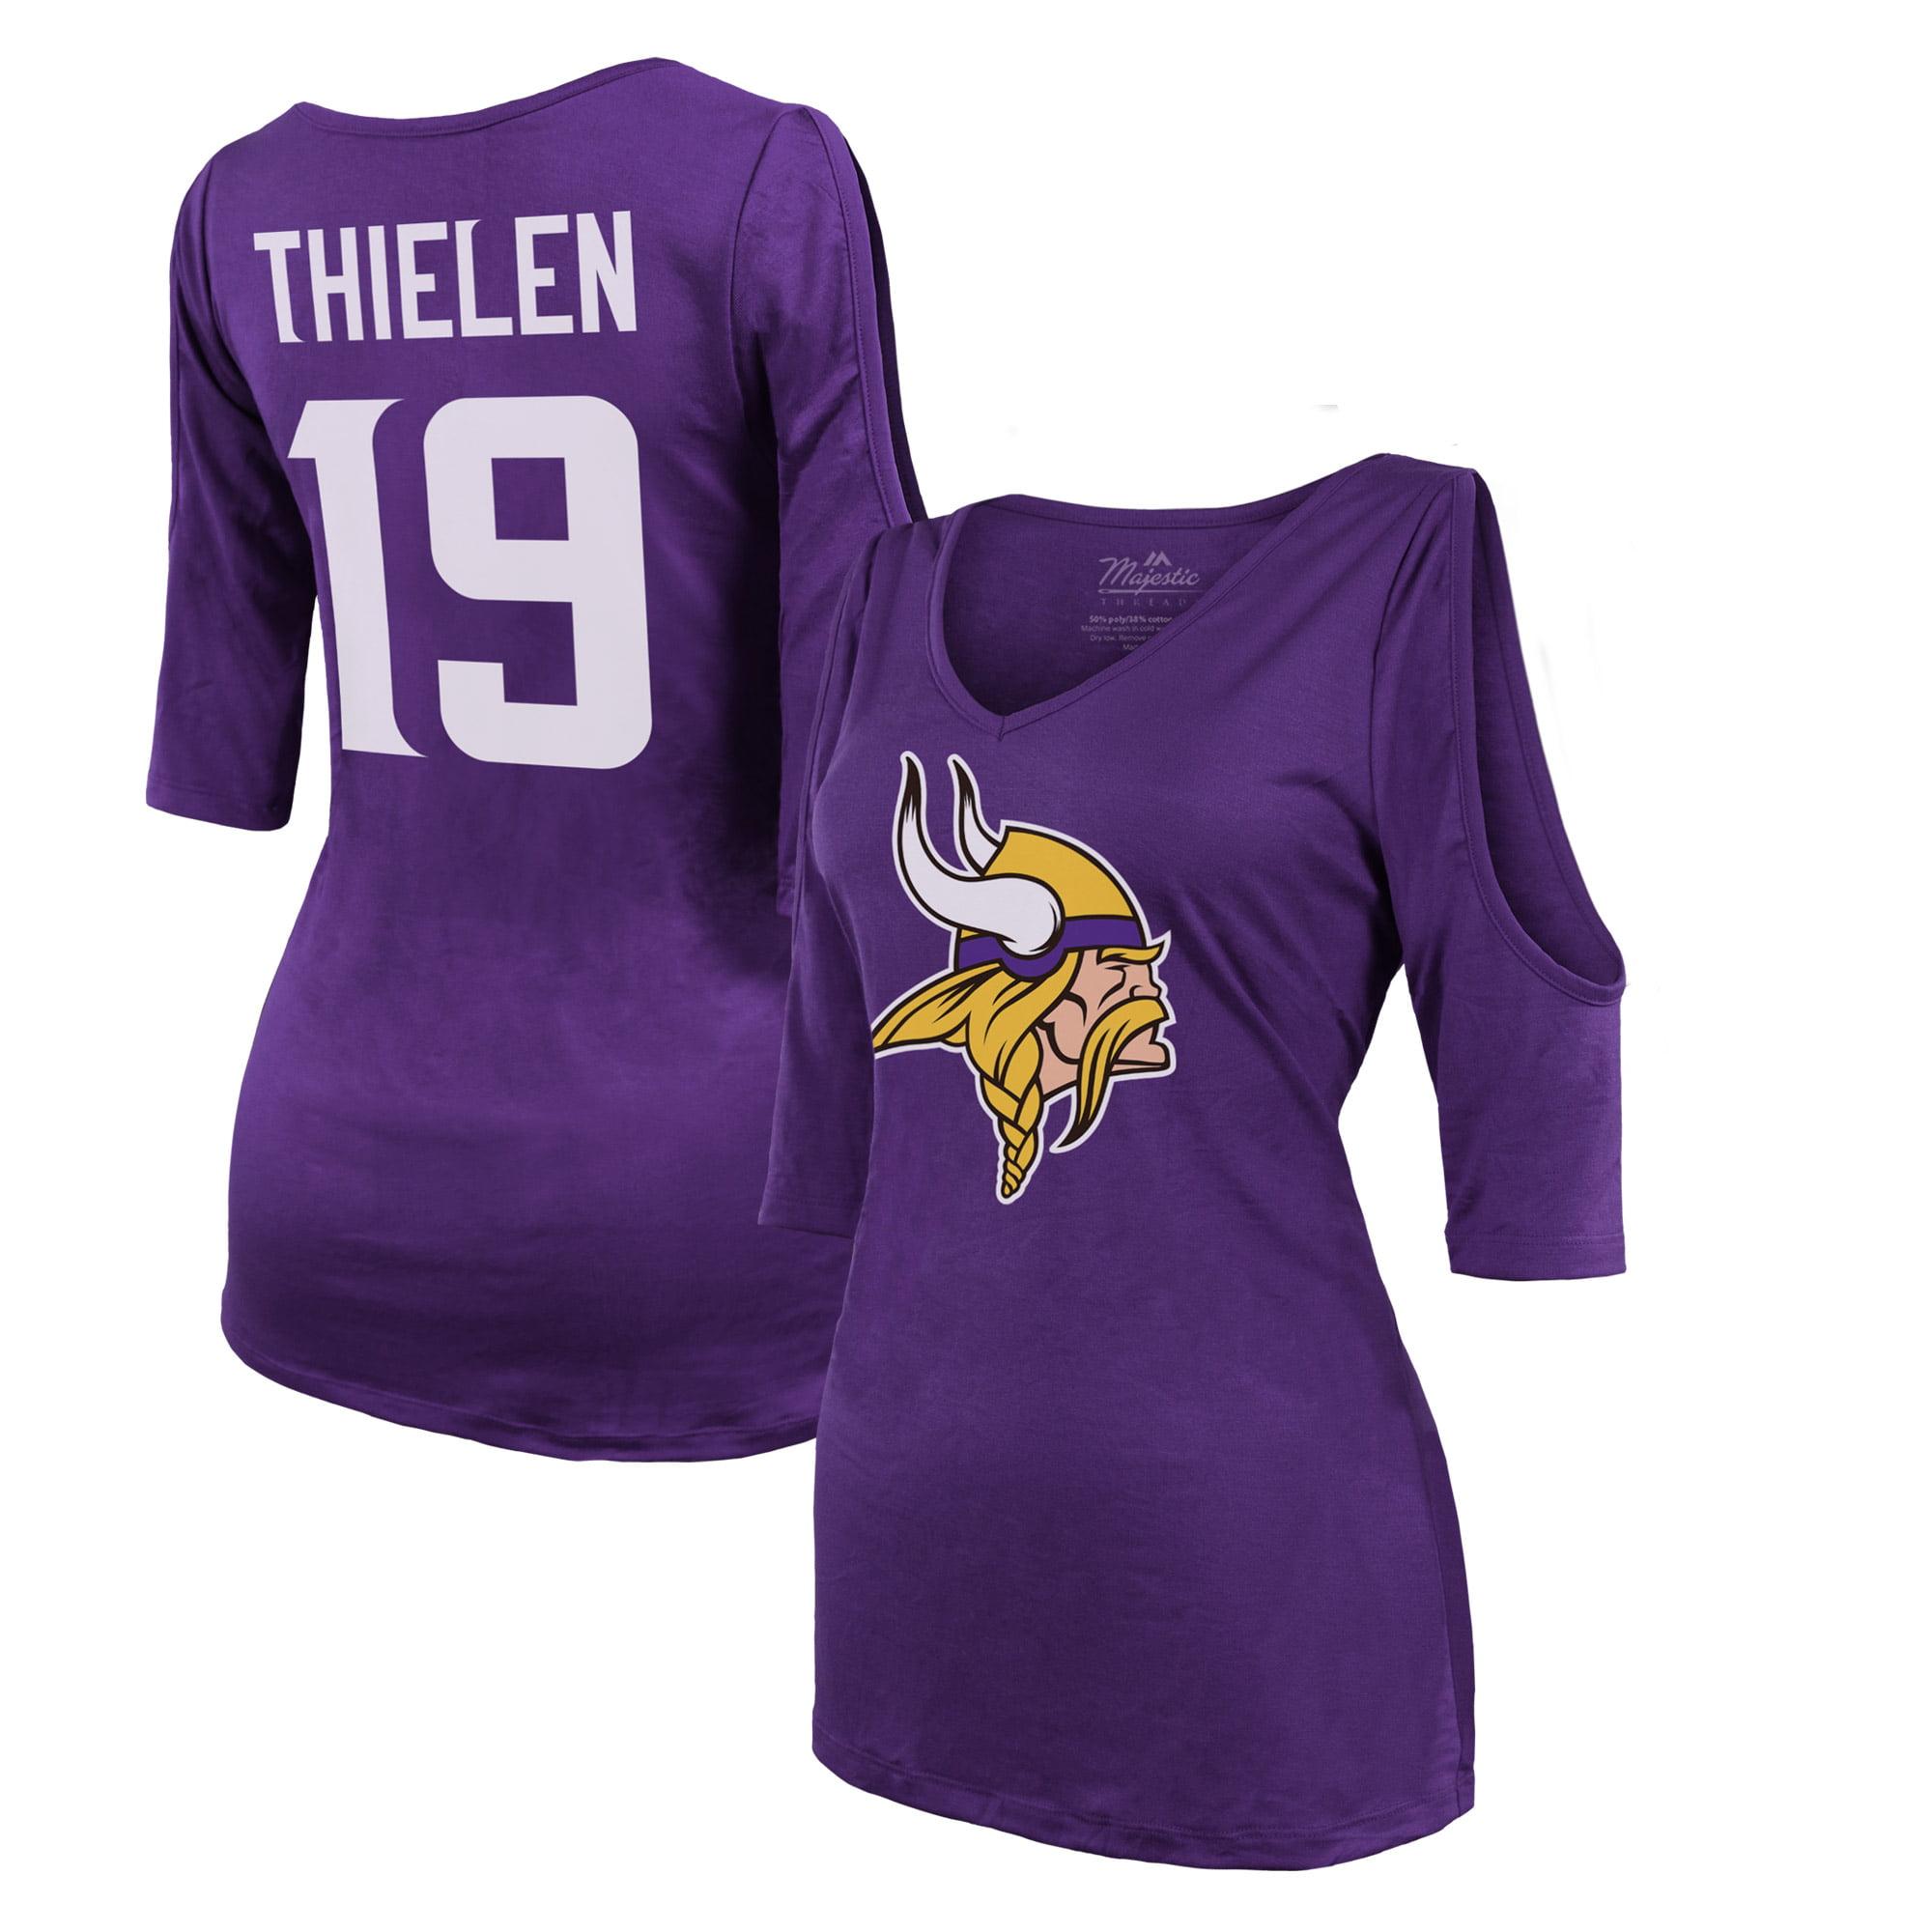 Adam Thielen Minnesota Vikings Majestic Threads Women's Player Name & Number Cold Shoulder Half-Sleeve V-Neck T-Shirt - Purple